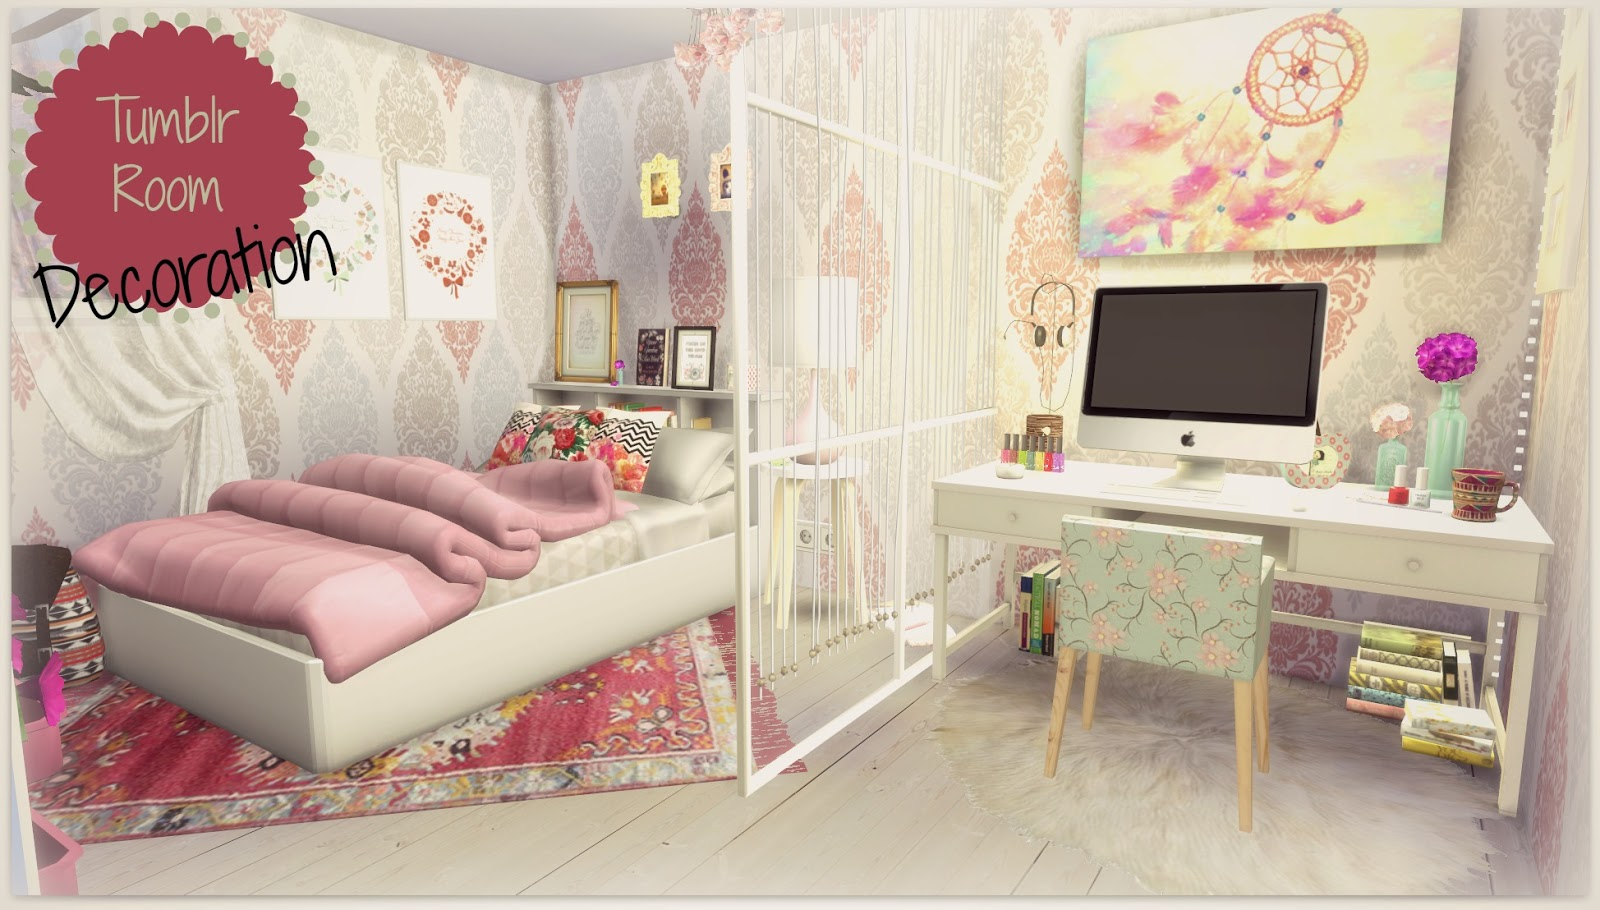 Sims 4 Tumblr Room